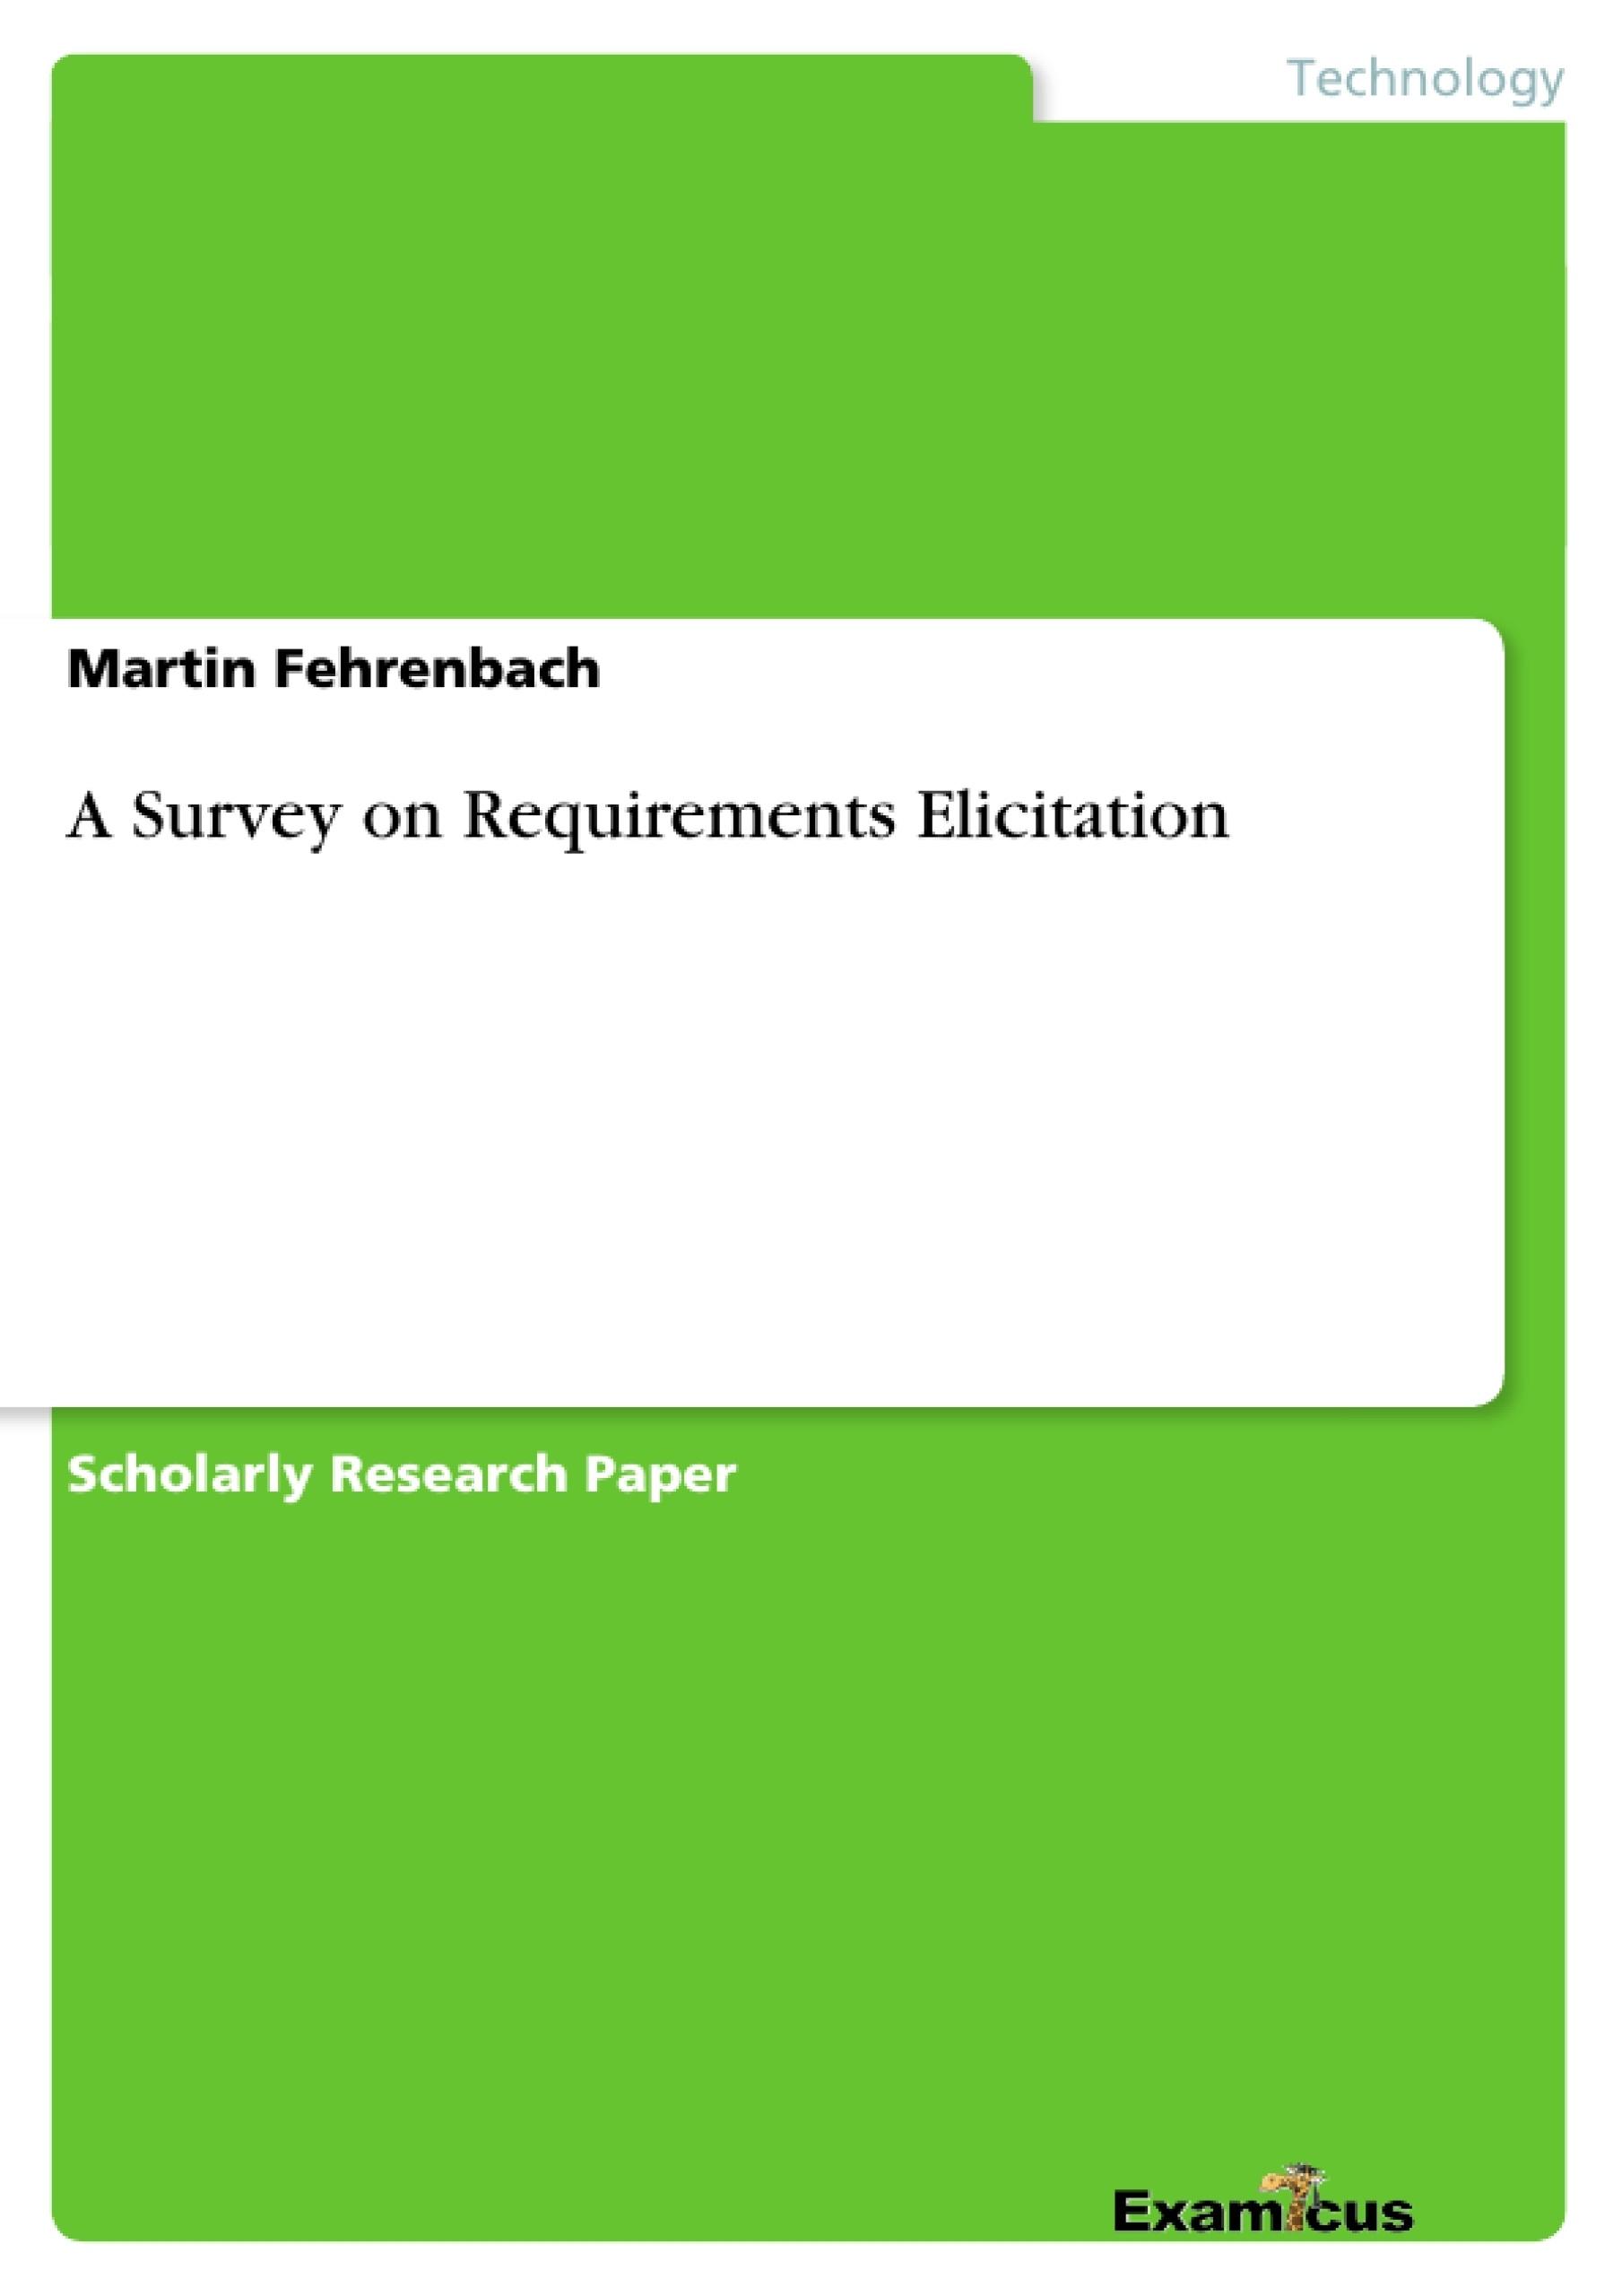 Title: A Survey on Requirements Elicitation